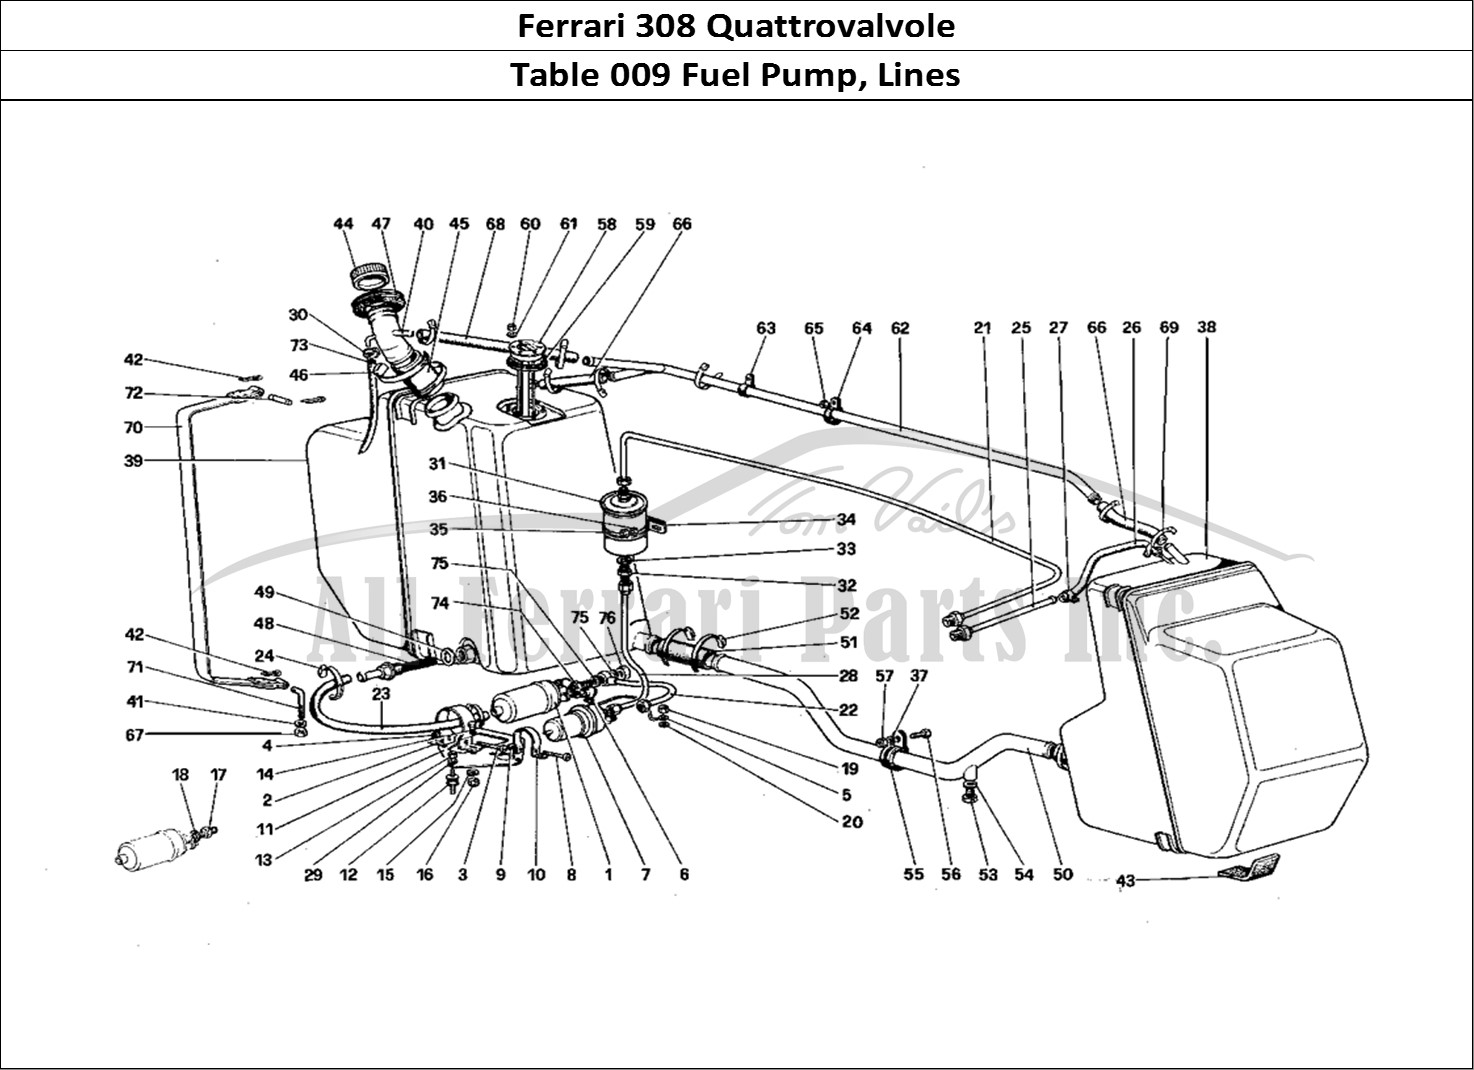 Buy Original Ferrari 308 Quattrovalvole 009 Fuel Pump